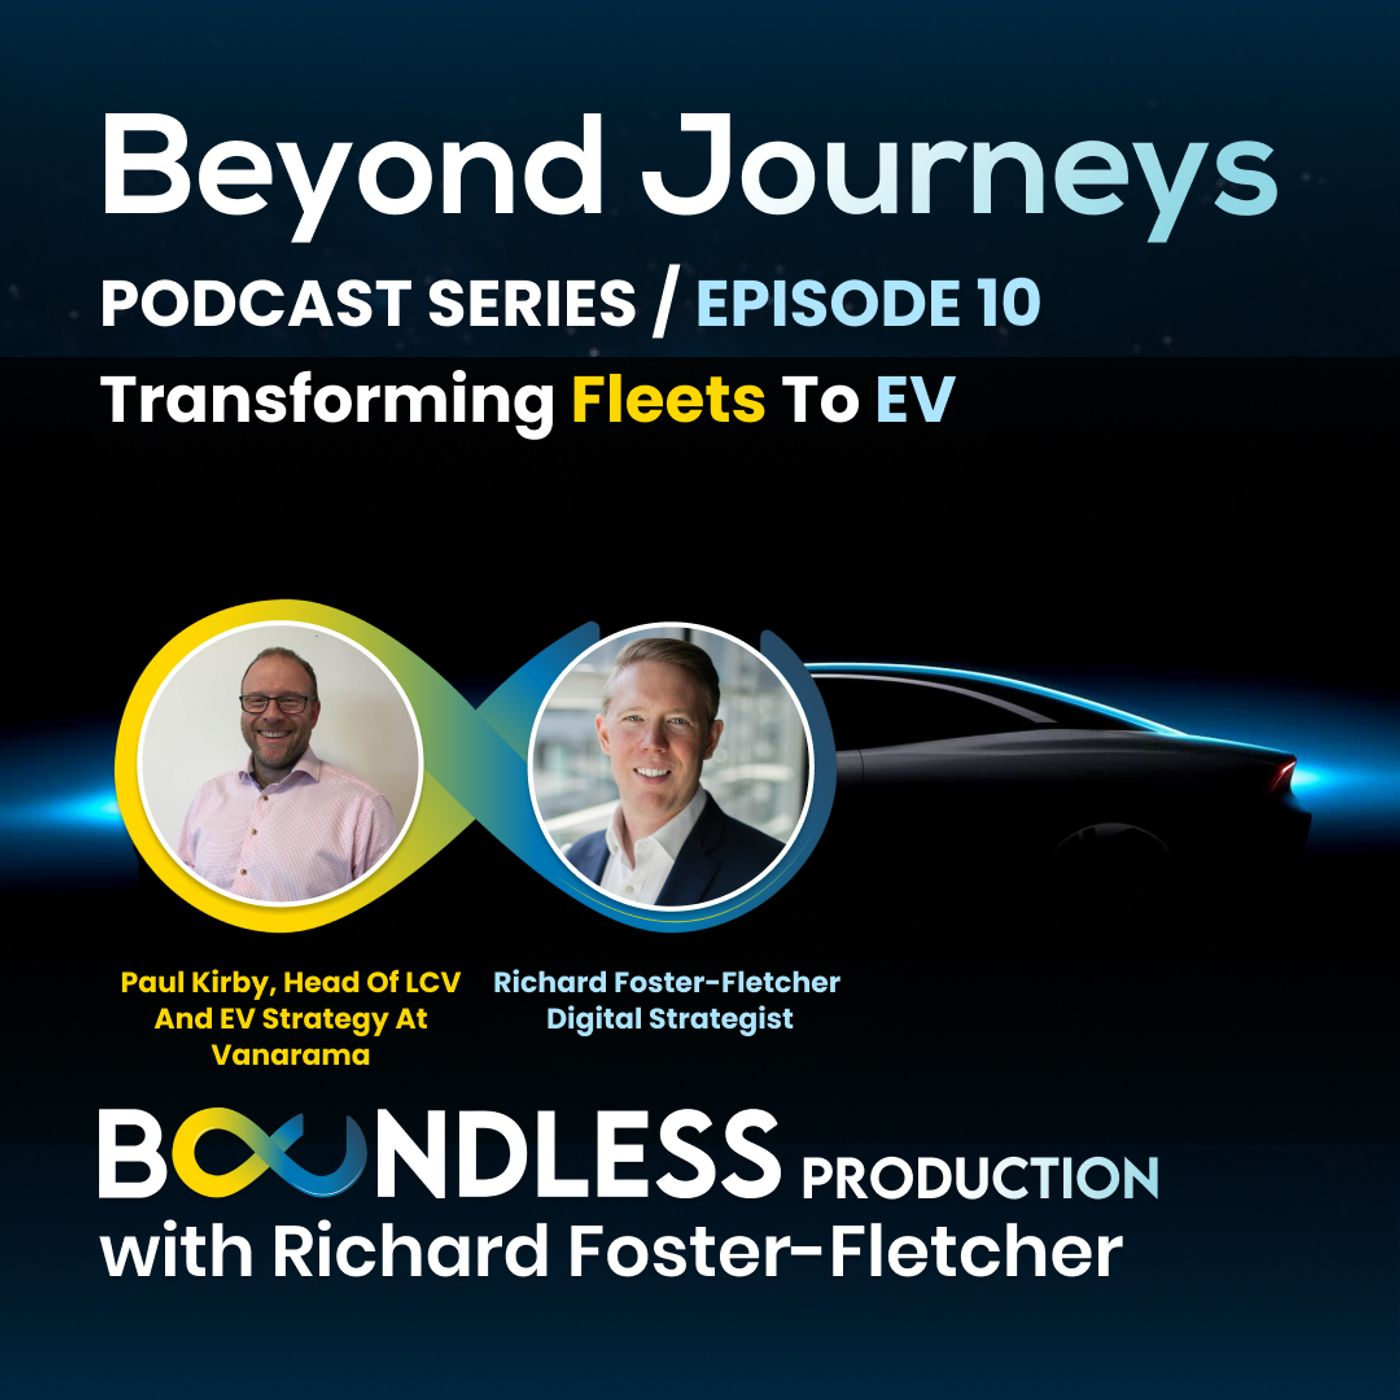 EP10 Beyond Journeys: Paul Kirby, Head of LCV and EV Strategy at Vanarama: Transforming fleets to EV